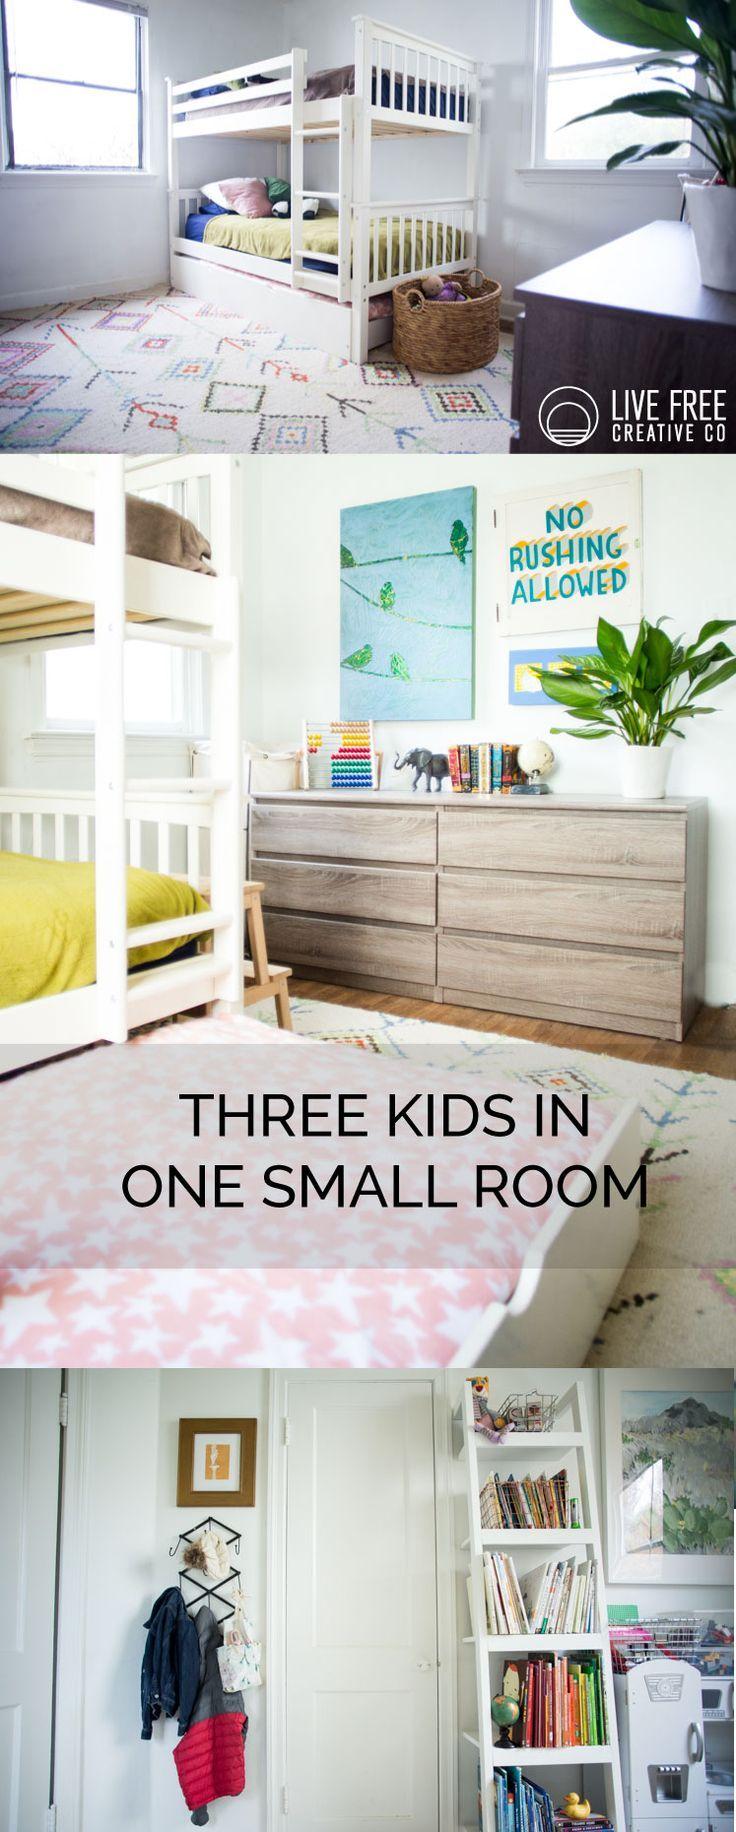 Kids Room Tour | Live Free Creative Co | Beautiful House | Pinterest ...